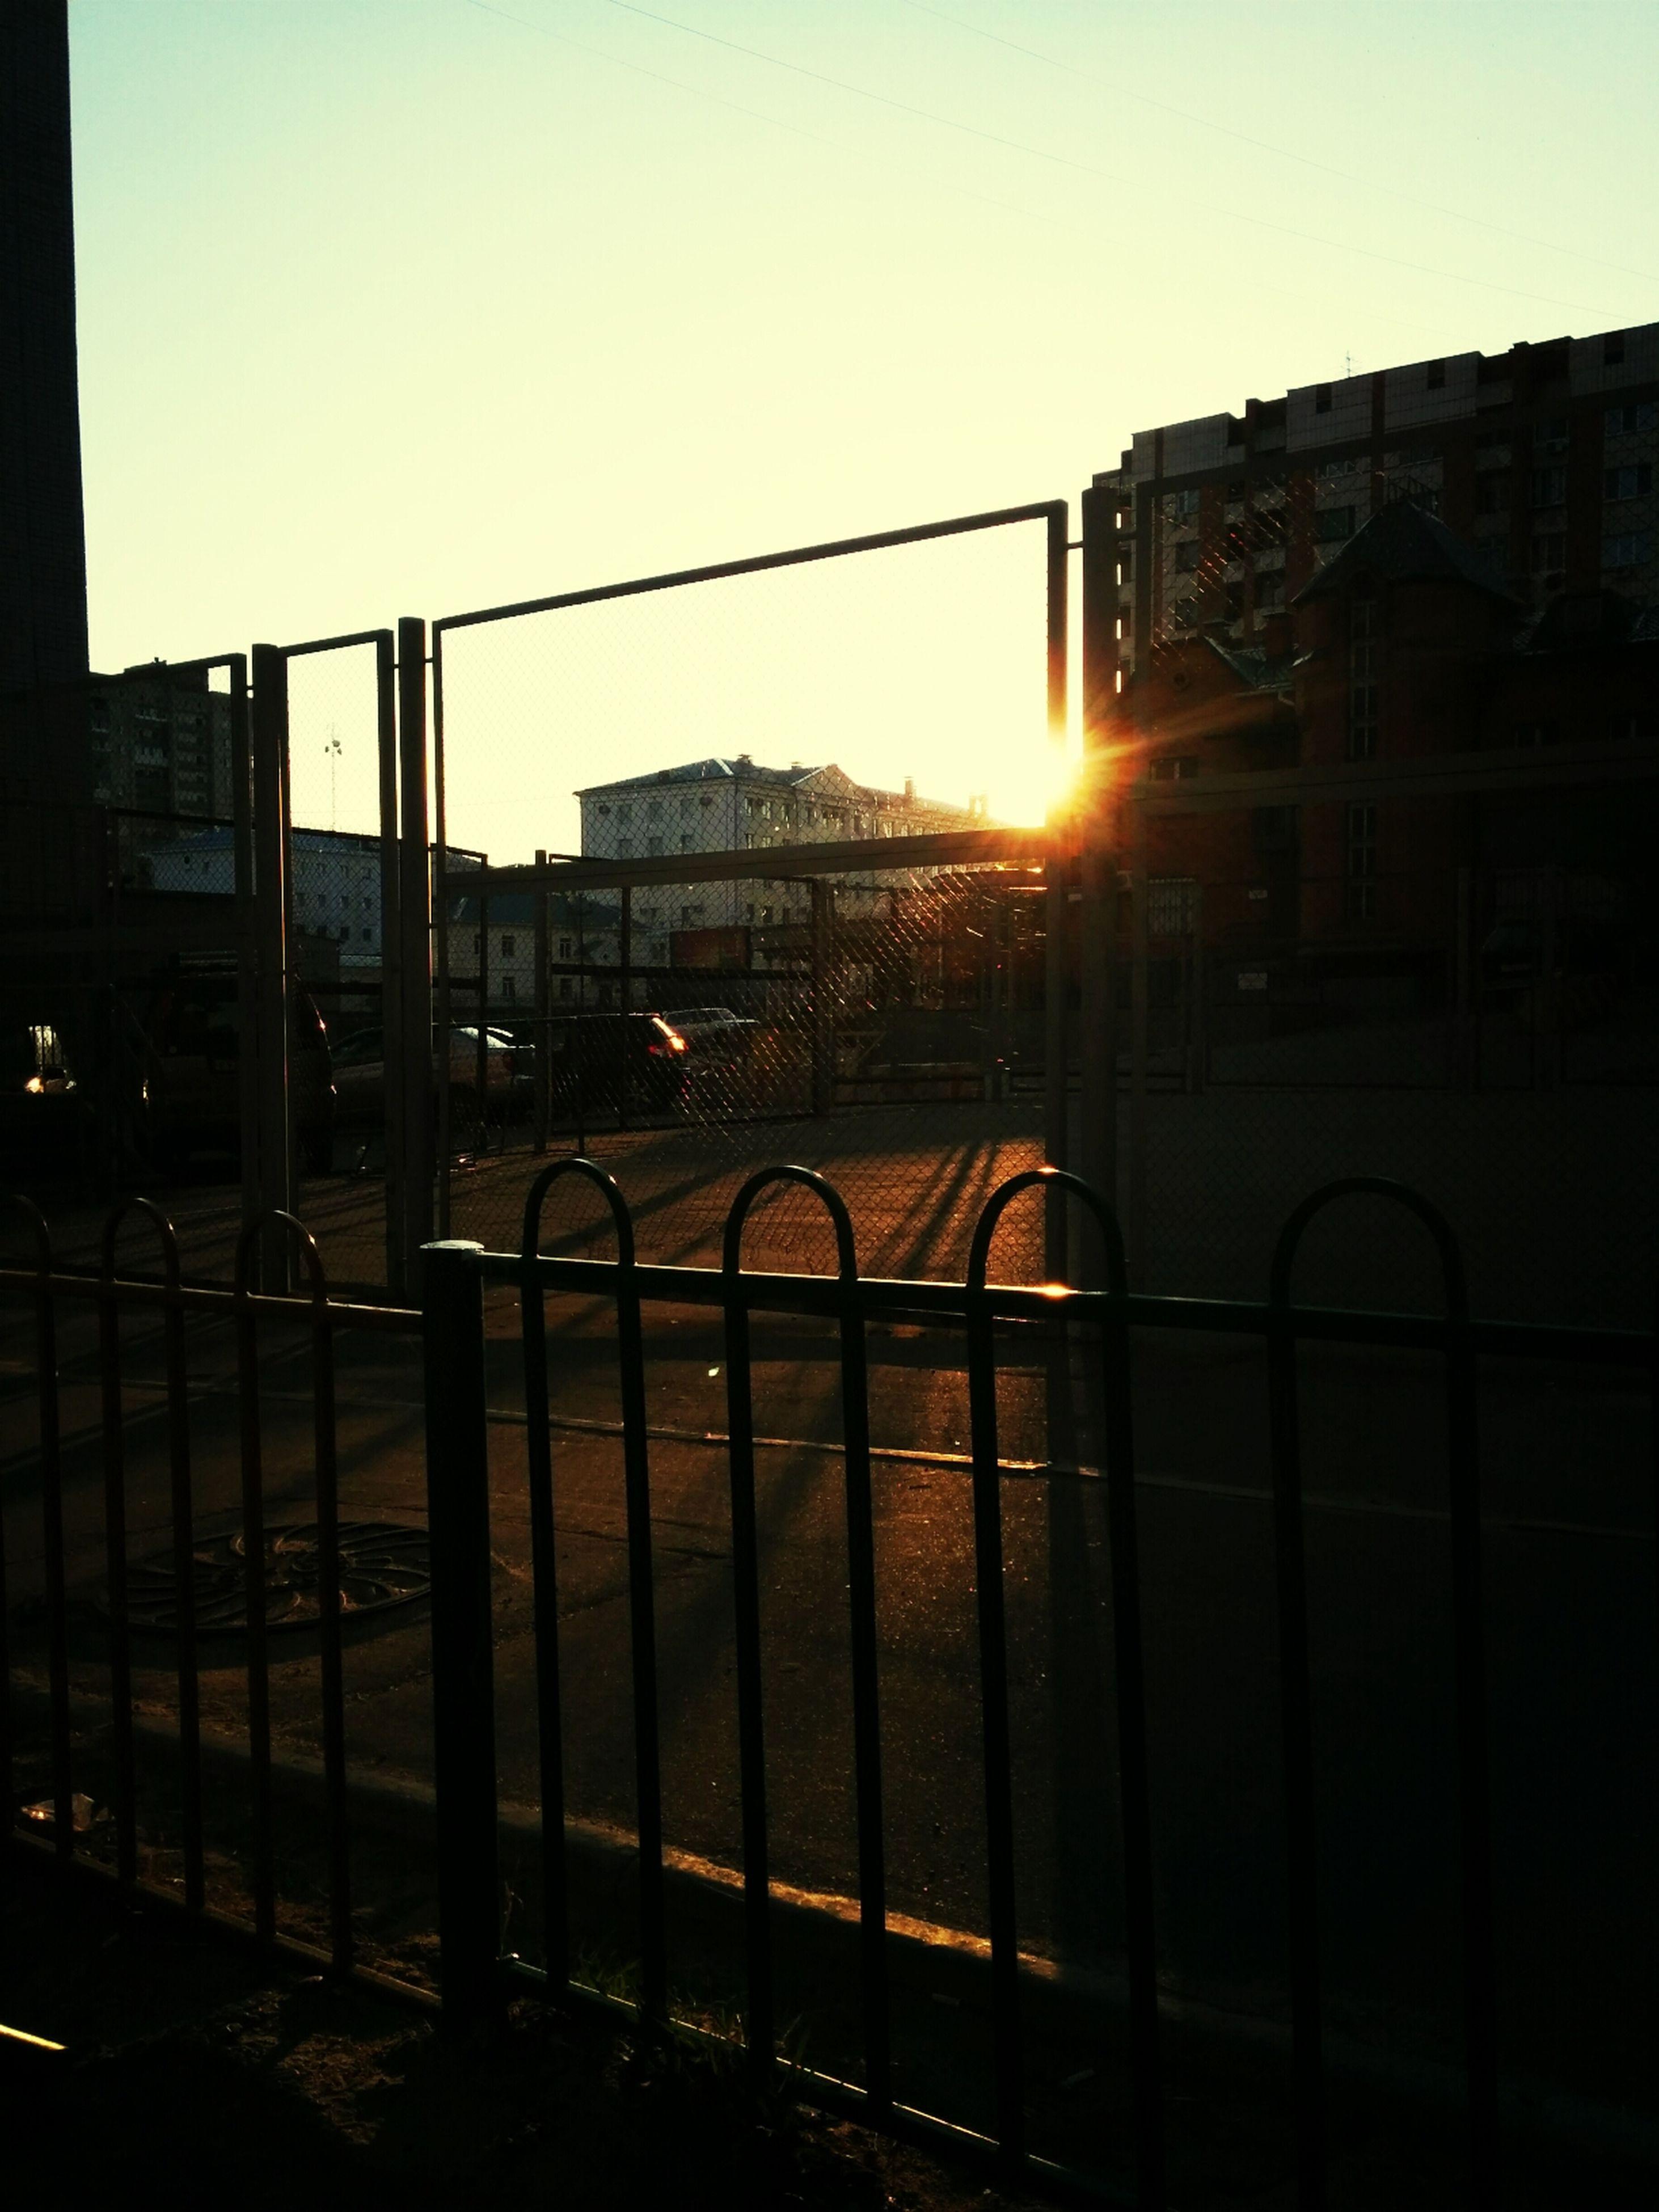 sunset, architecture, building exterior, built structure, sun, city, sunlight, silhouette, sky, building, railing, clear sky, orange color, transportation, sunbeam, lens flare, no people, railroad track, outdoors, street light